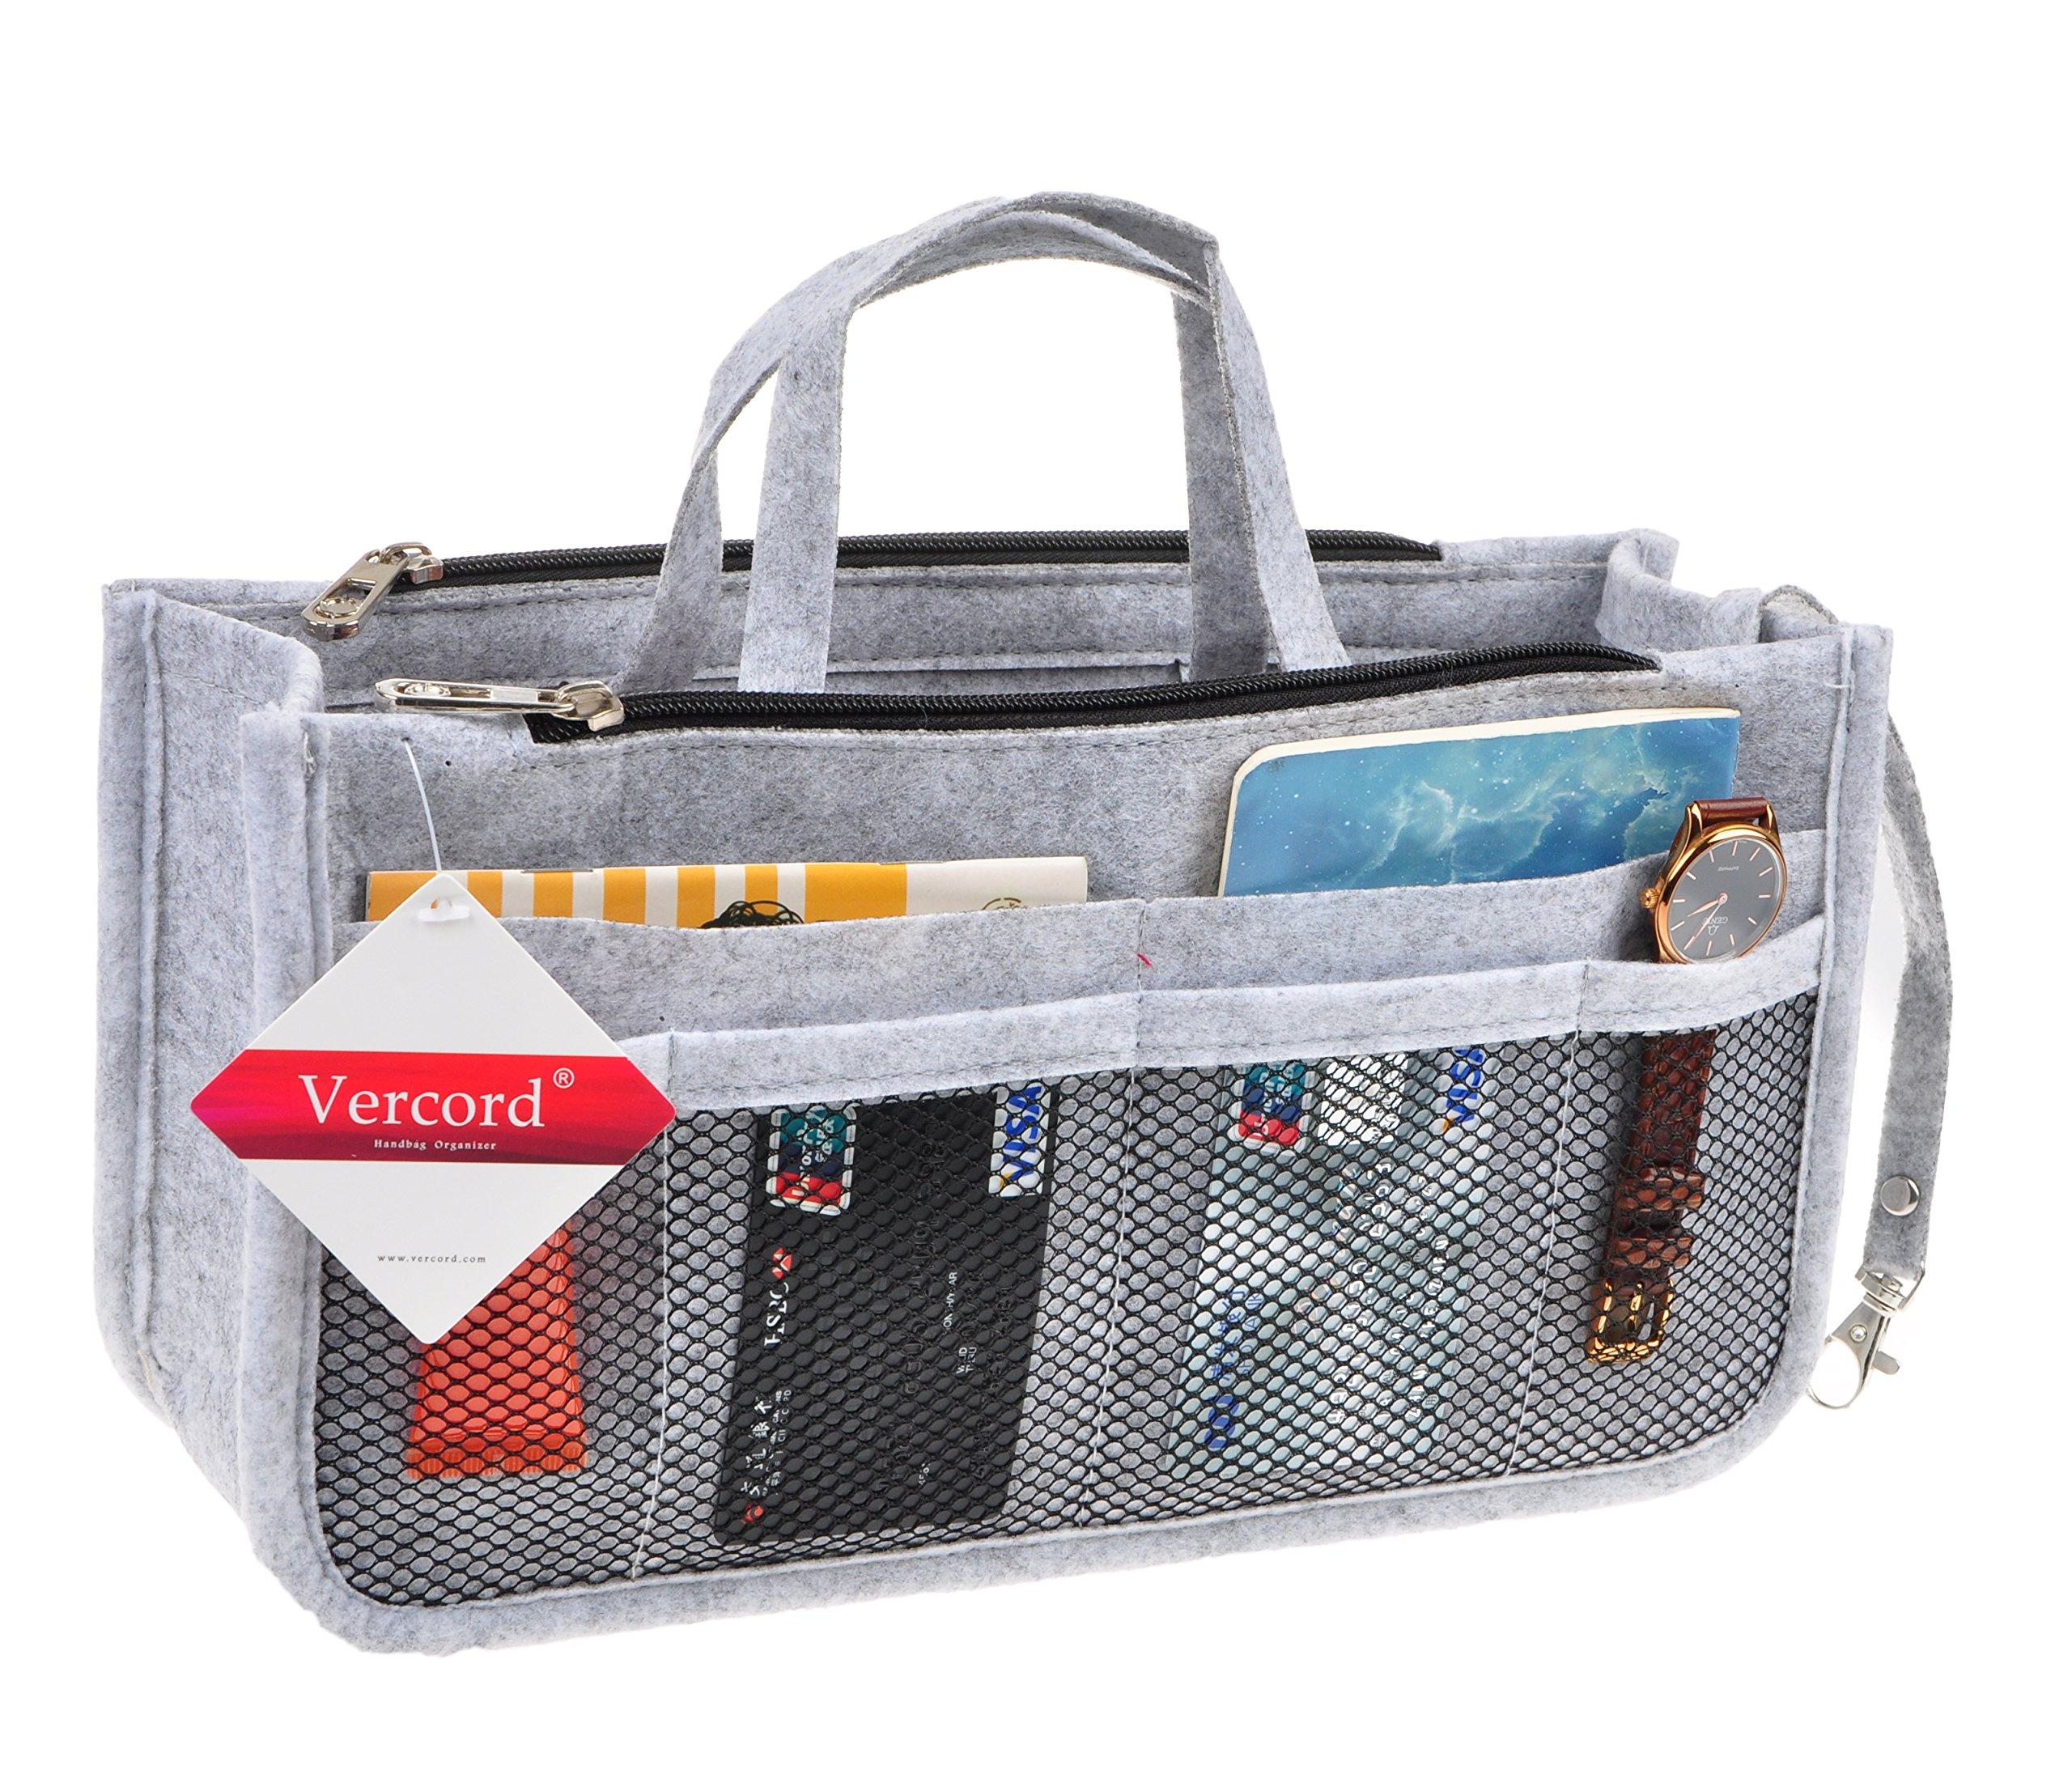 Vercord Sturdy Felt Handbag Purse Organizer Insert With Keychain 17 Compartments, Light Grey L